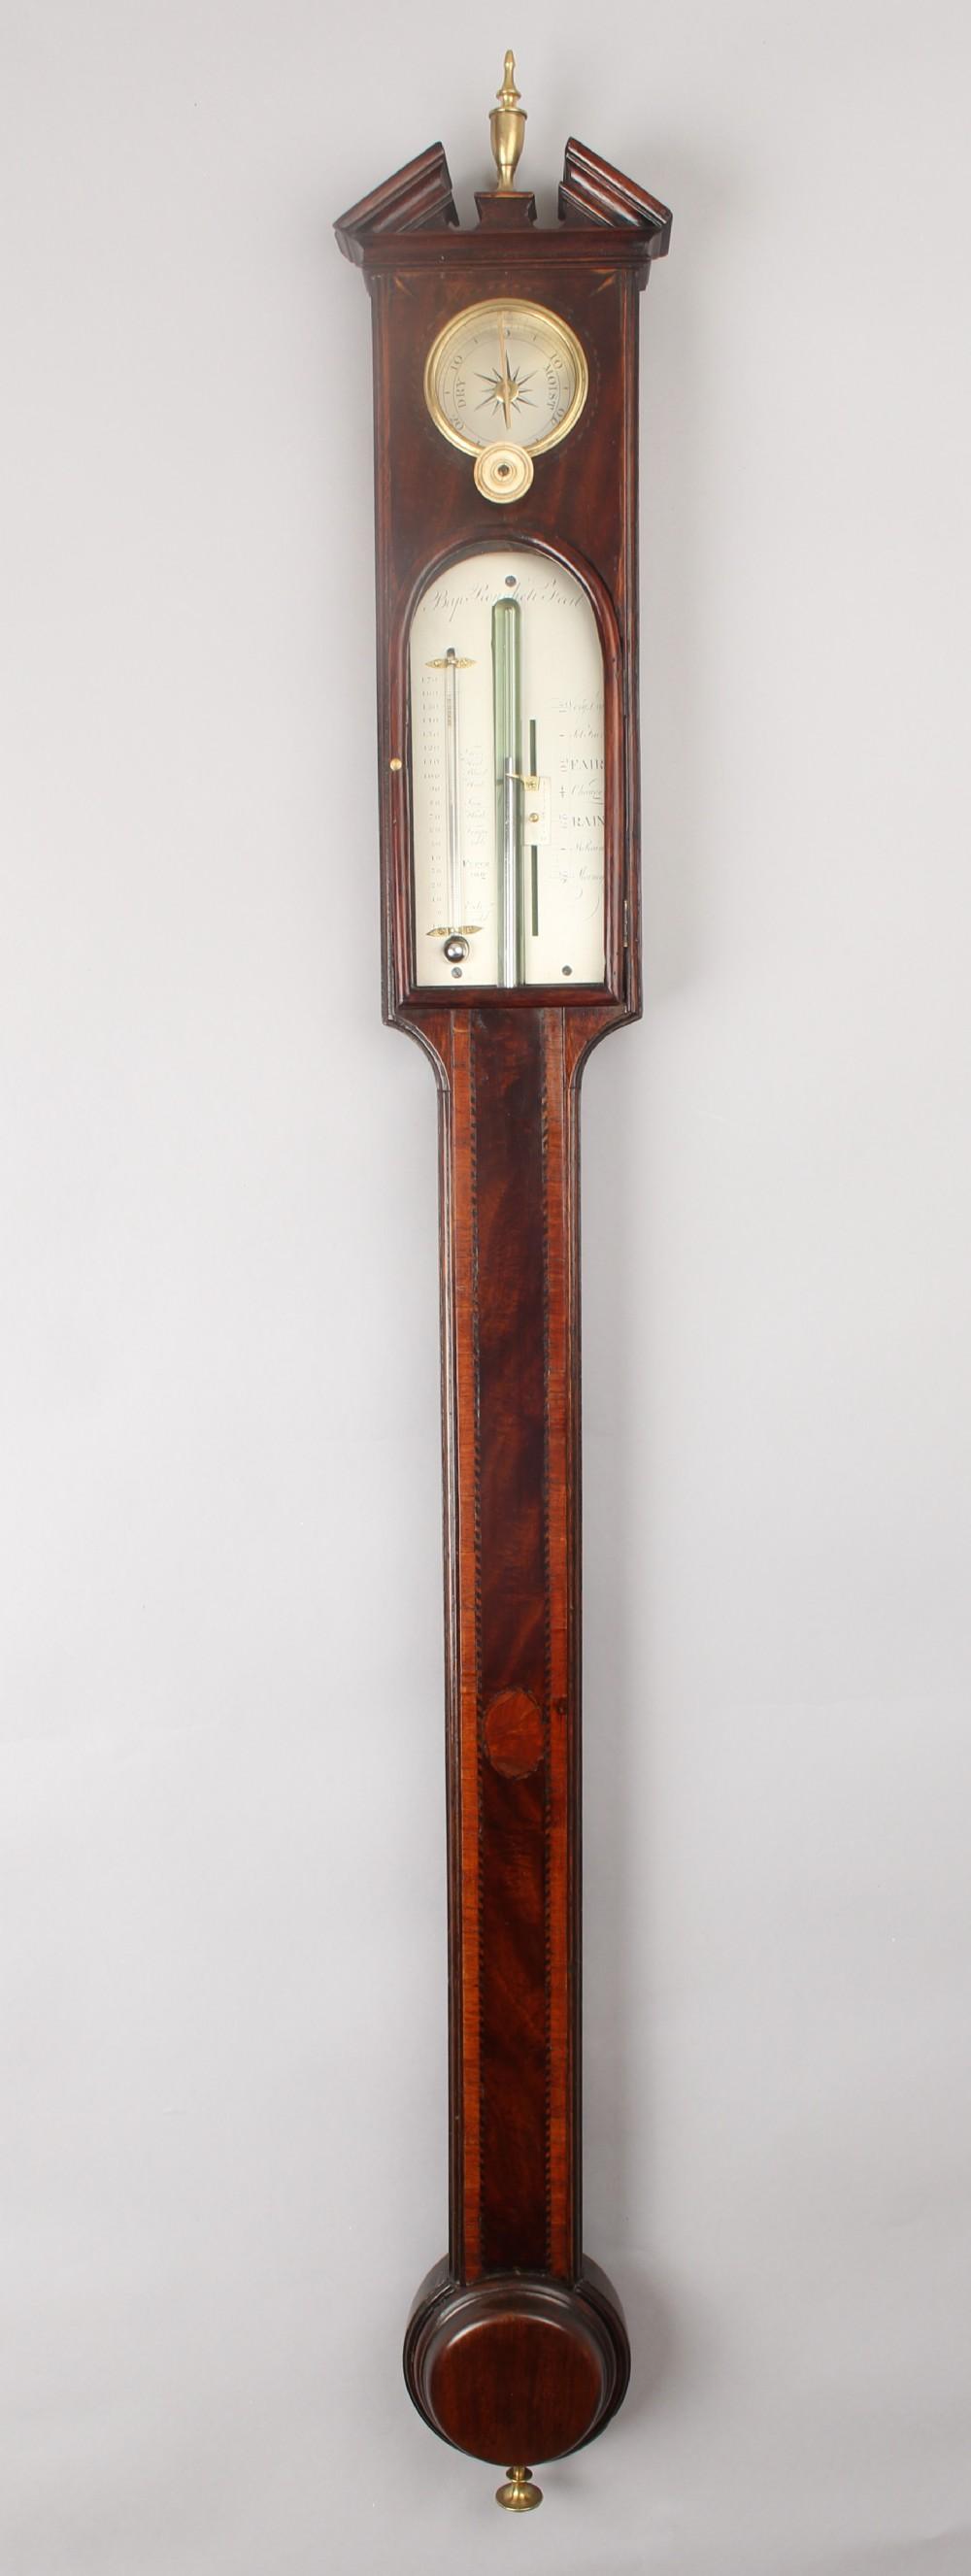 a george iii period mahogany stick barometer by baptista ronchetti of london